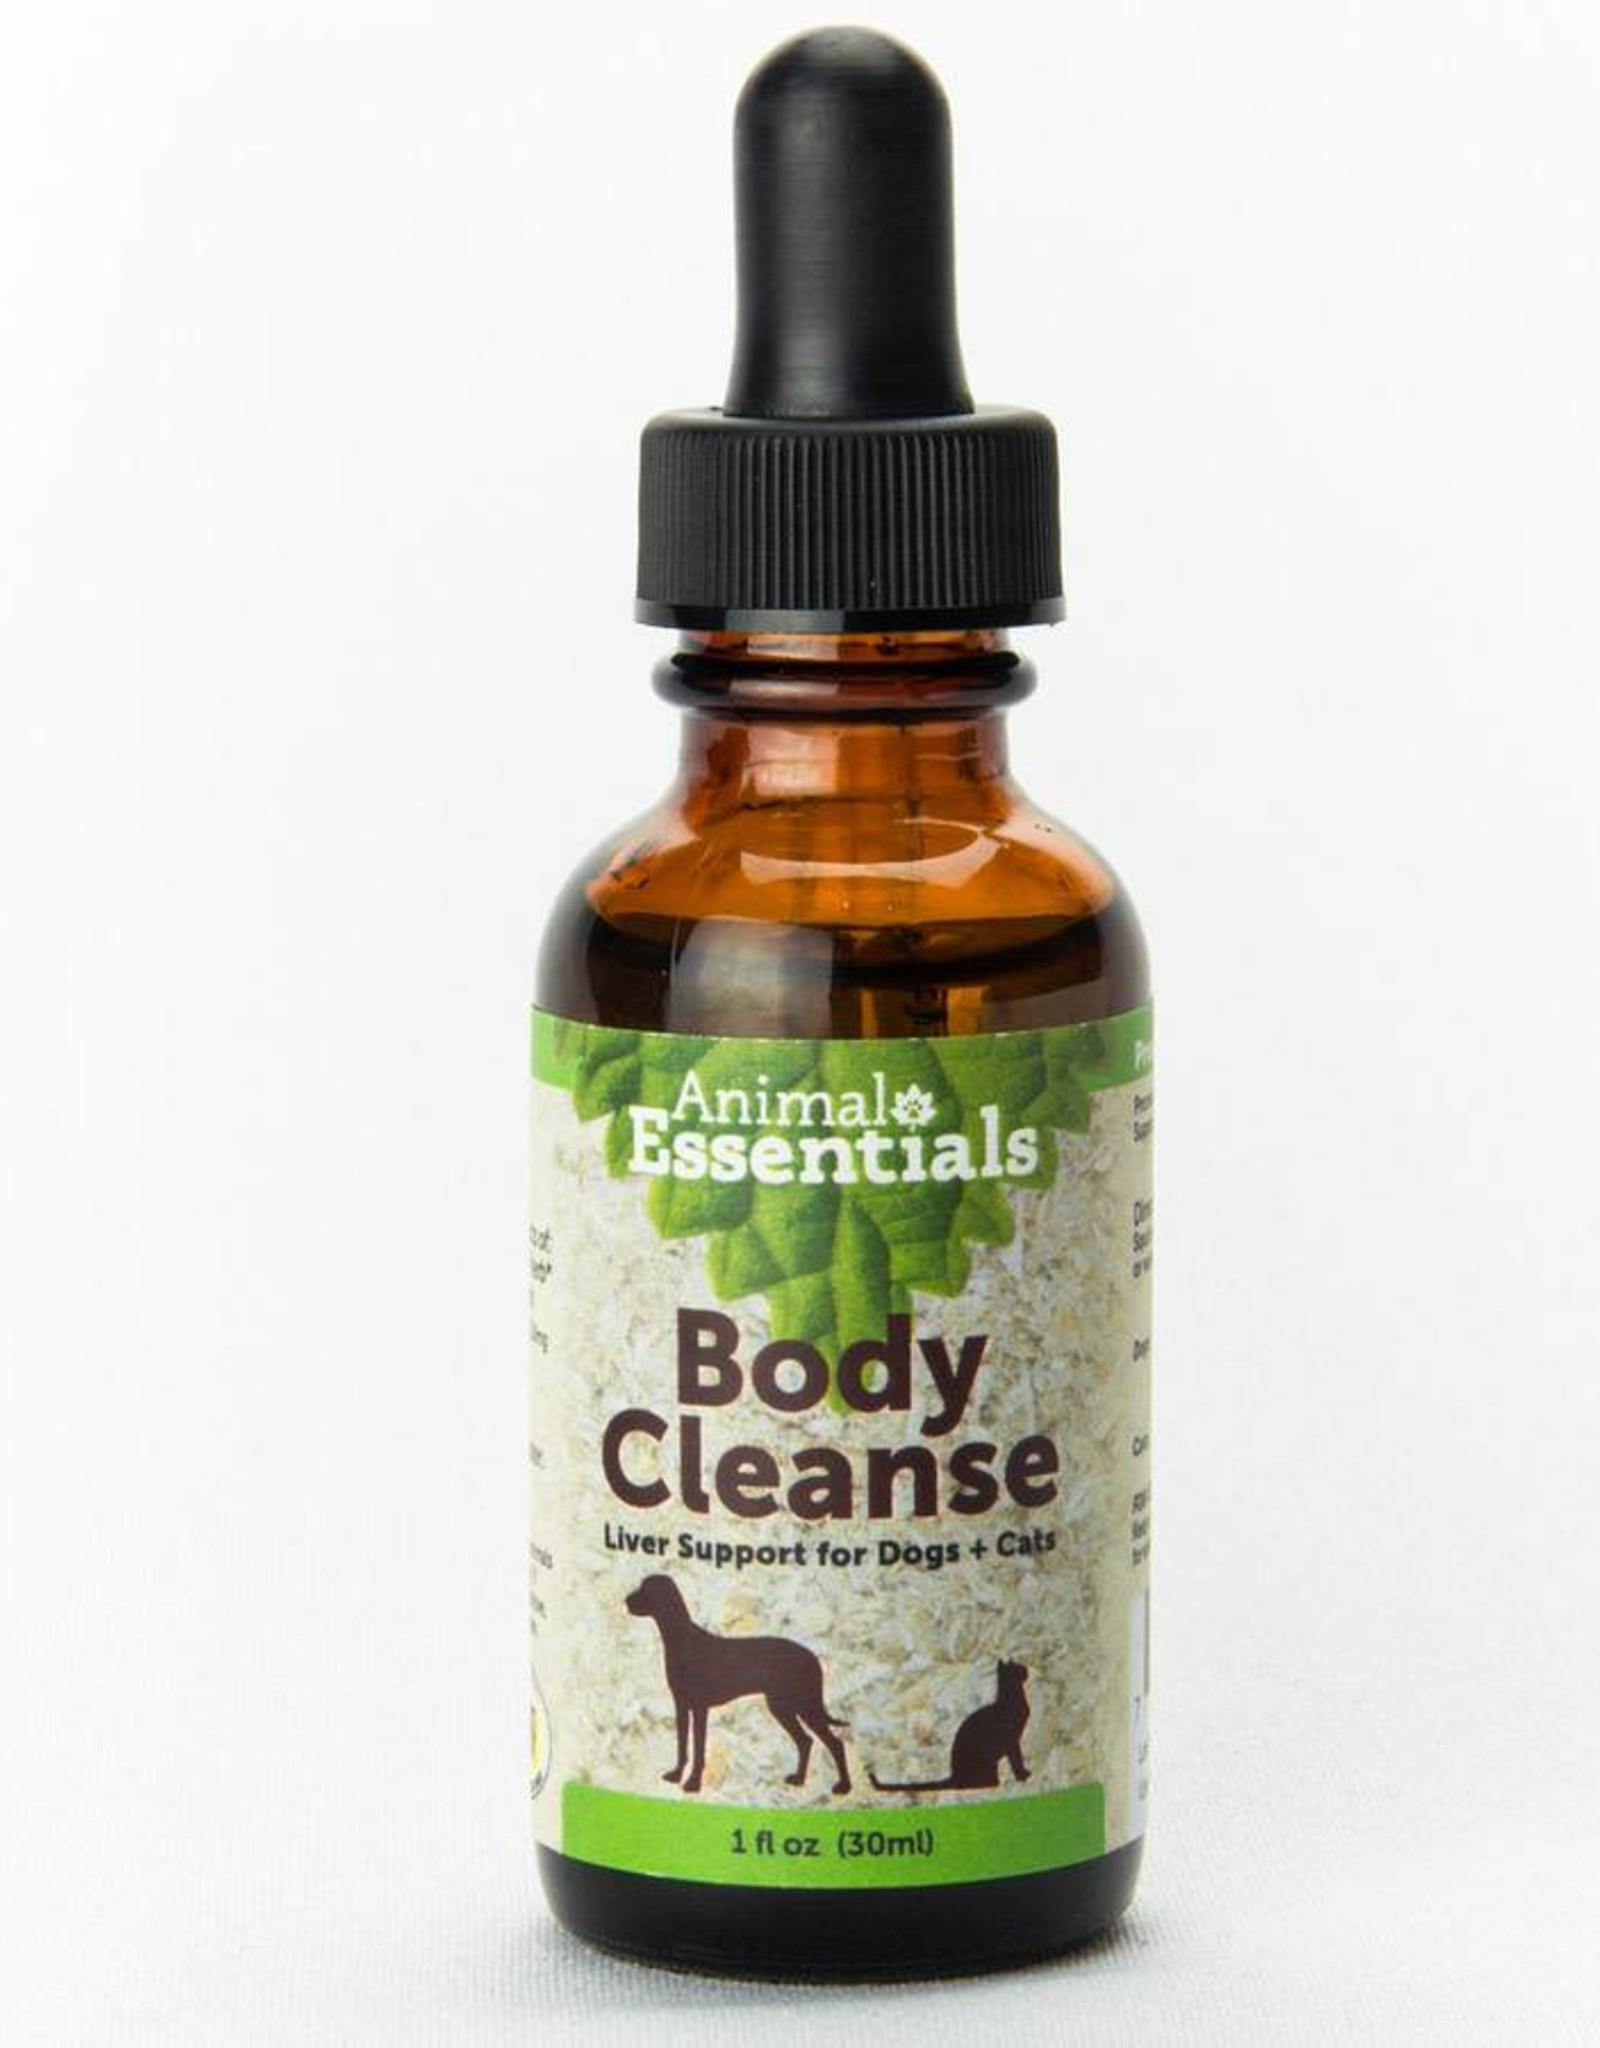 Animal Essentials Animal Essentials Body Cleanse 1oz